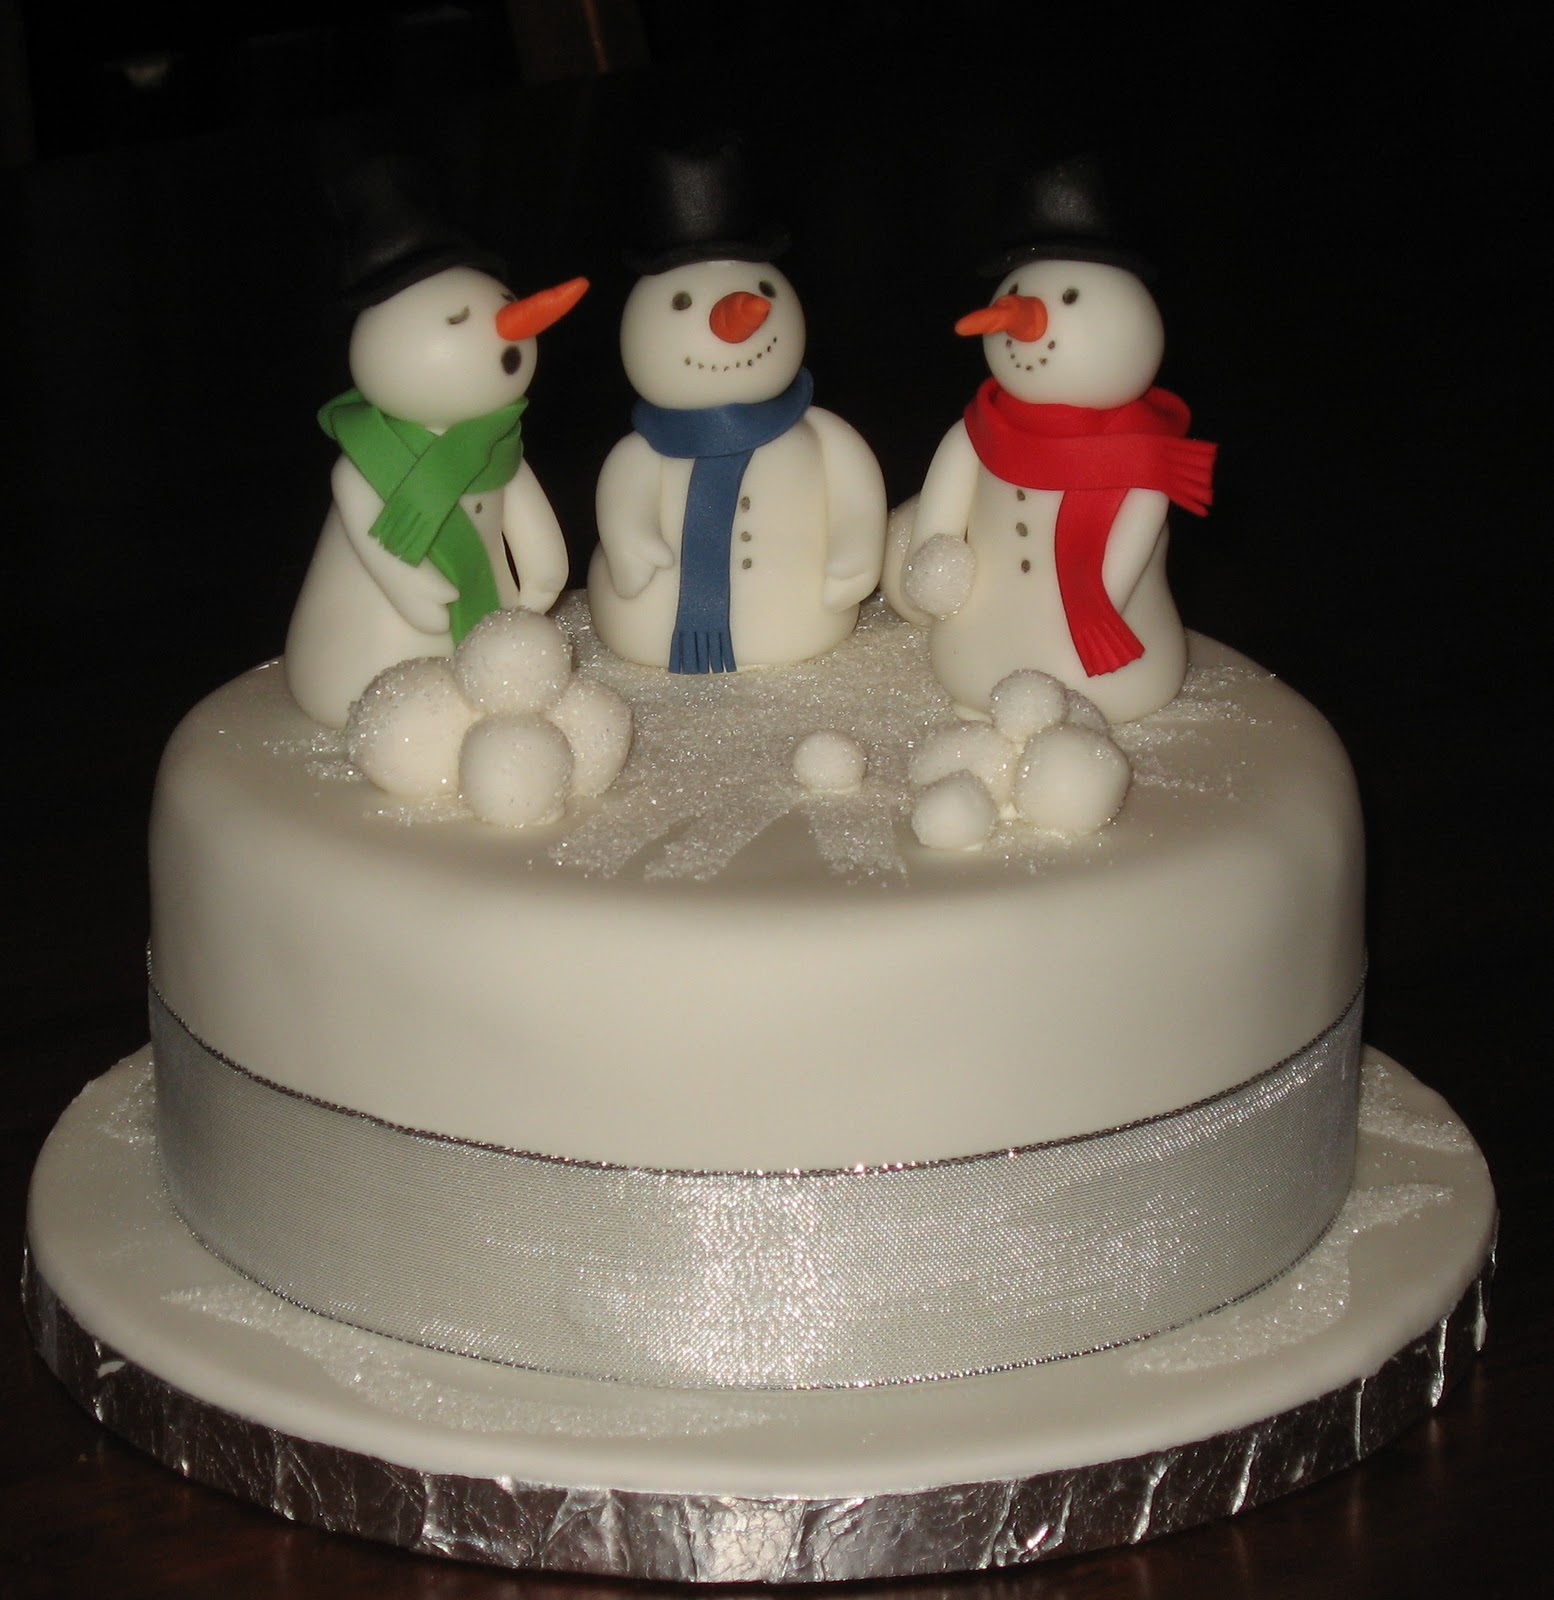 Let Them Eat Cake: Three Snowmen